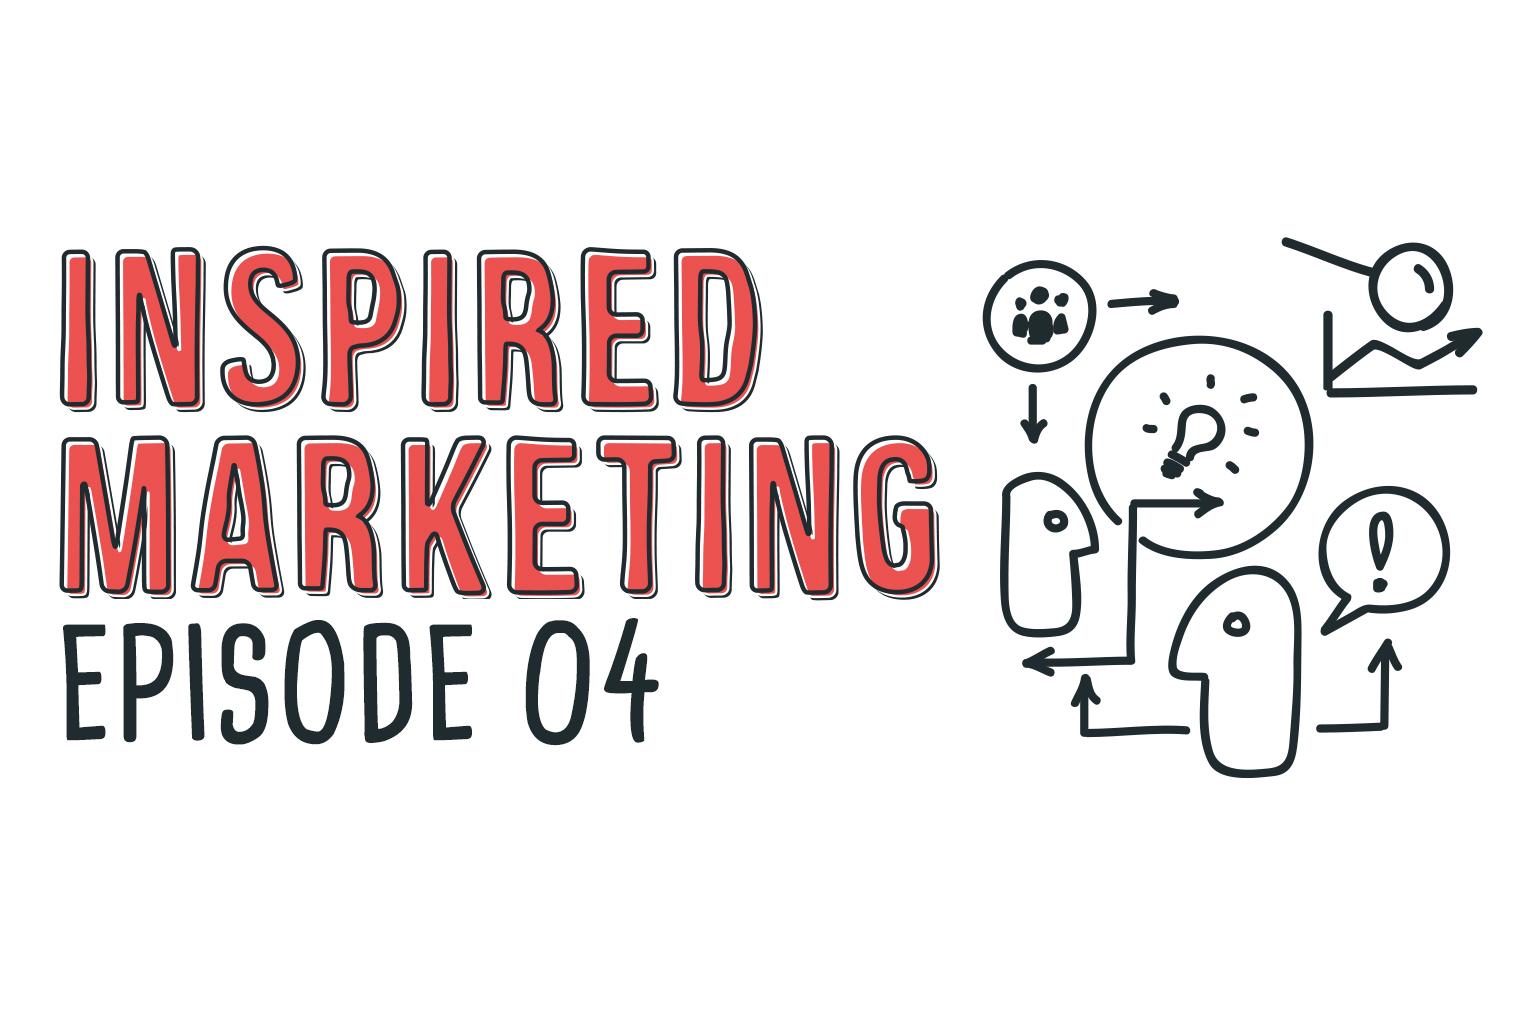 Inspired Marketing Episode 4